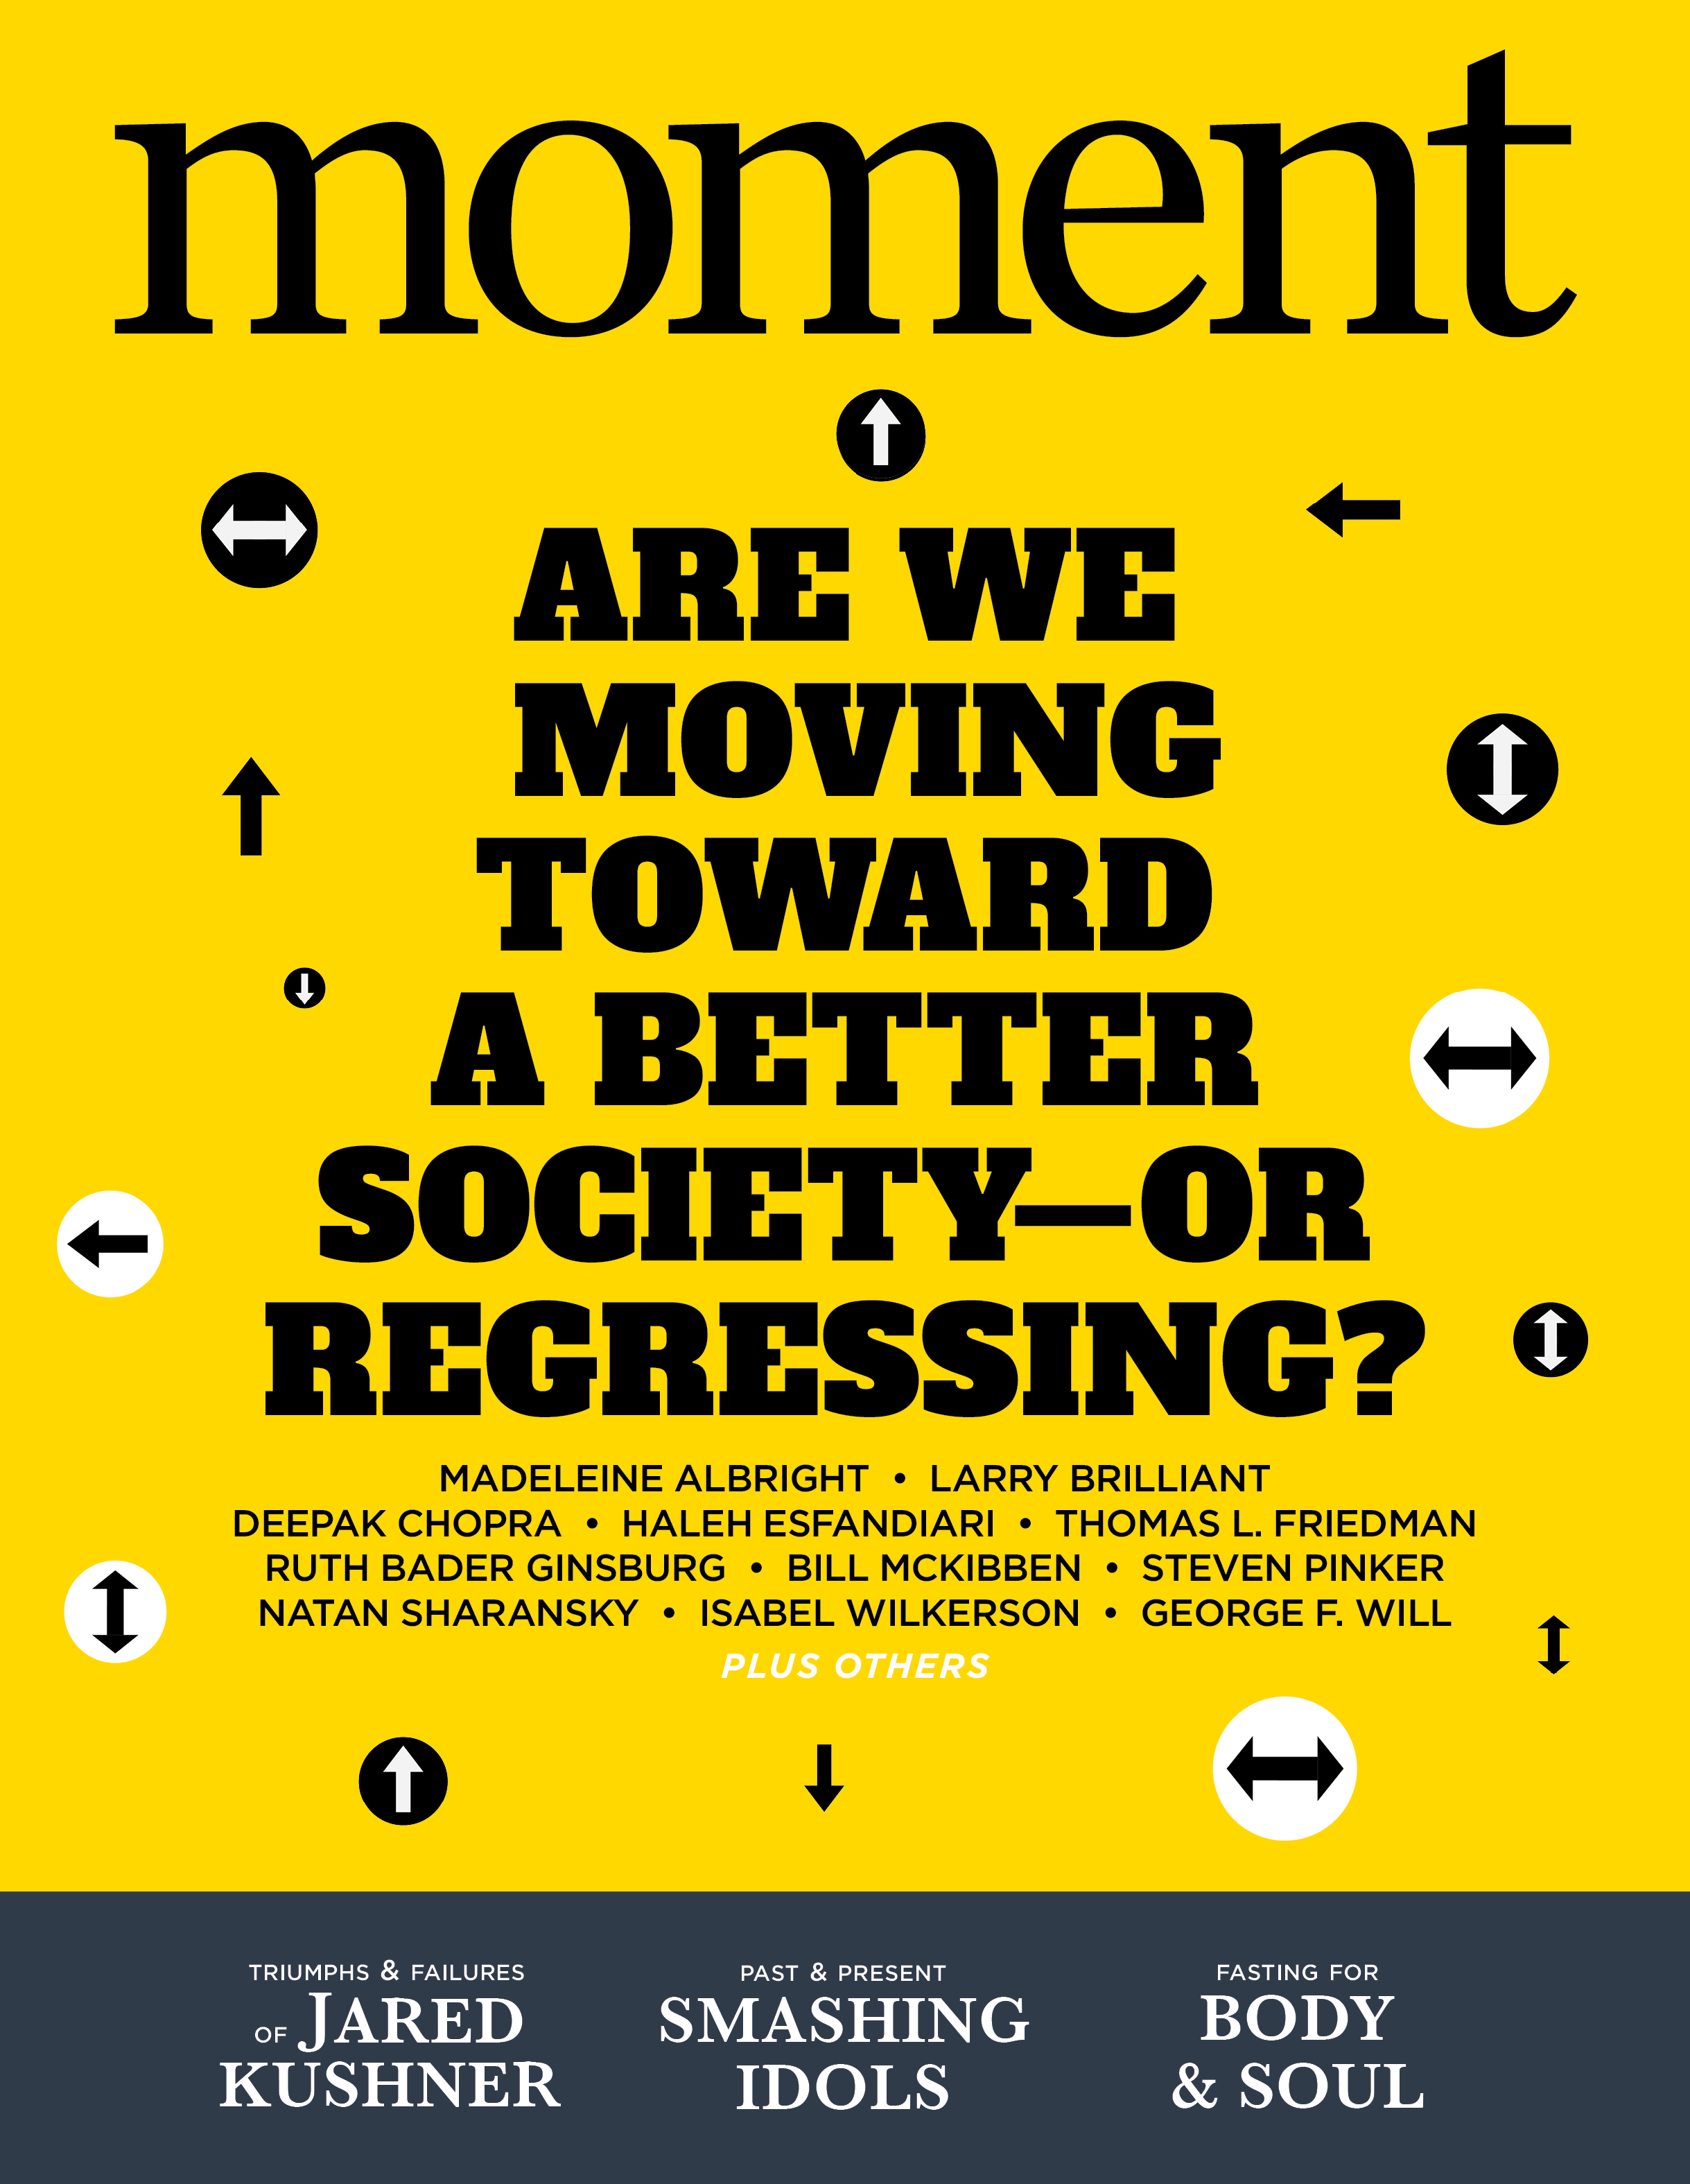 Moment Magazine Sept-Oct 2020